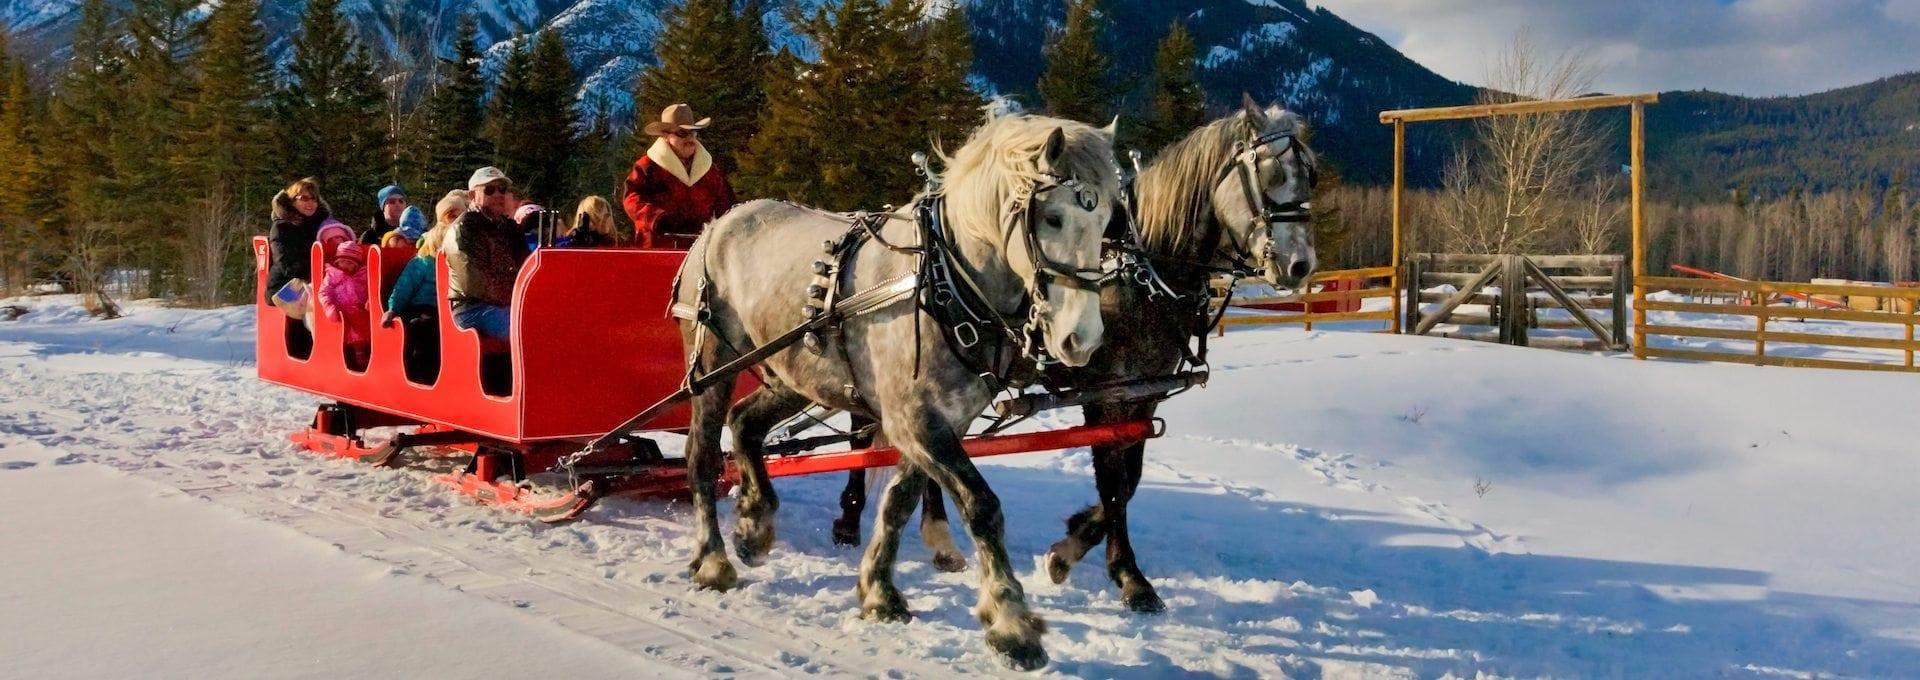 banff sleigh rides discover banff tours